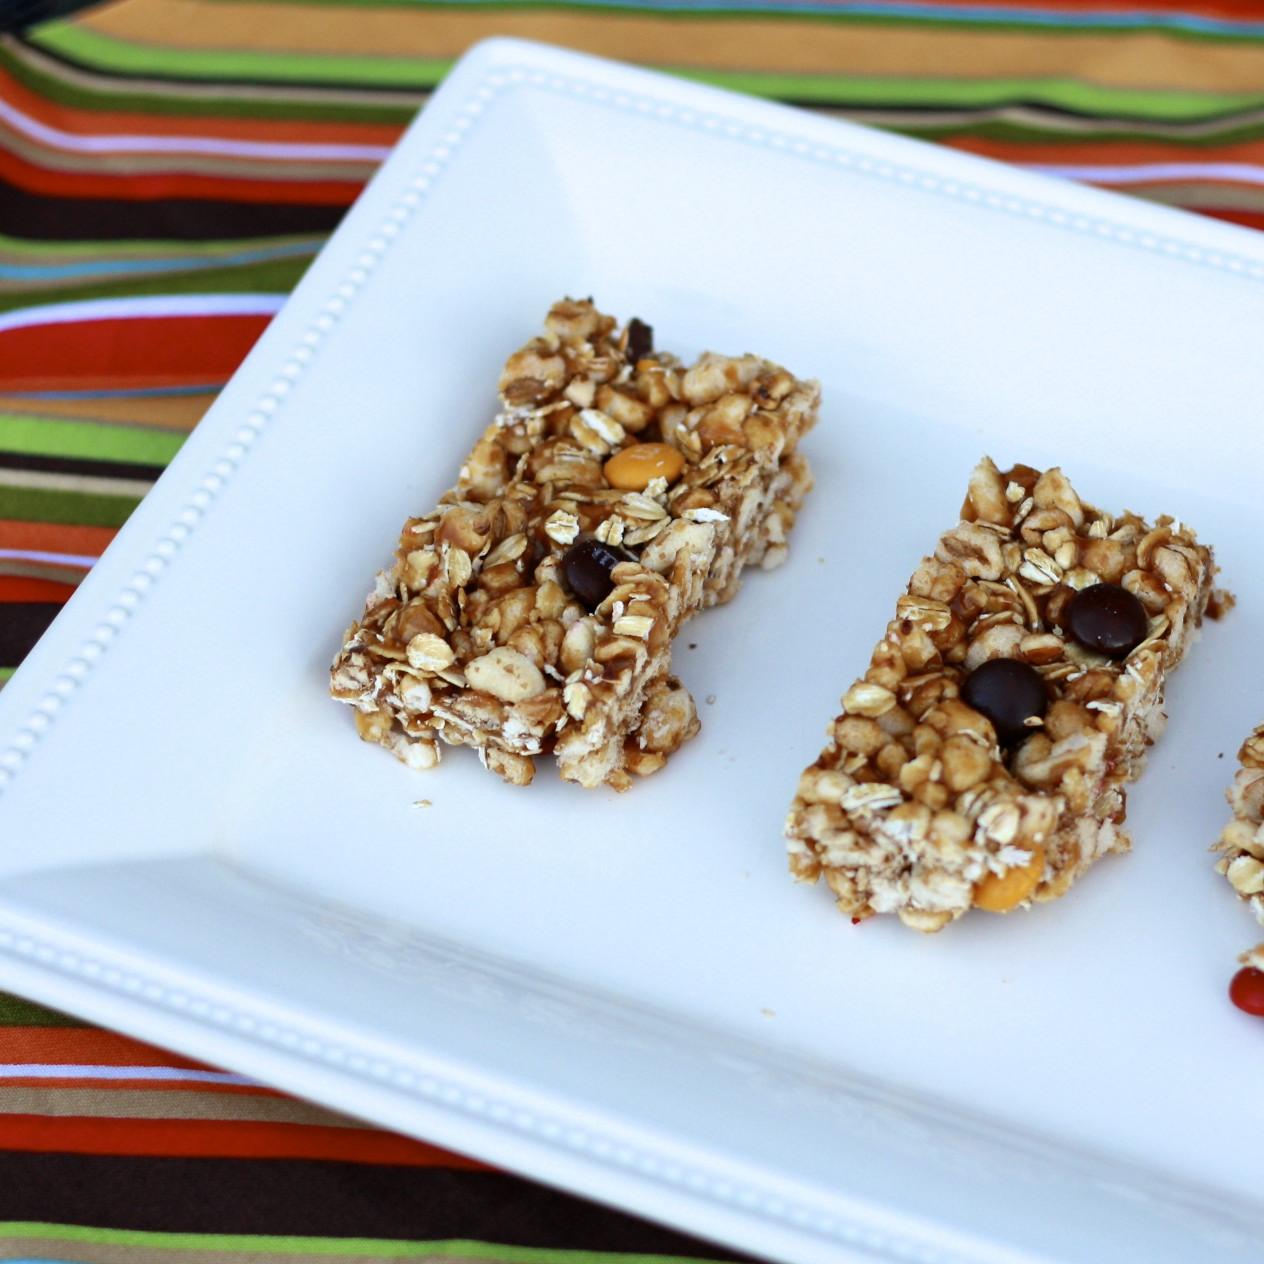 The Sweets Life: No Bake Biscoff Granola Bars